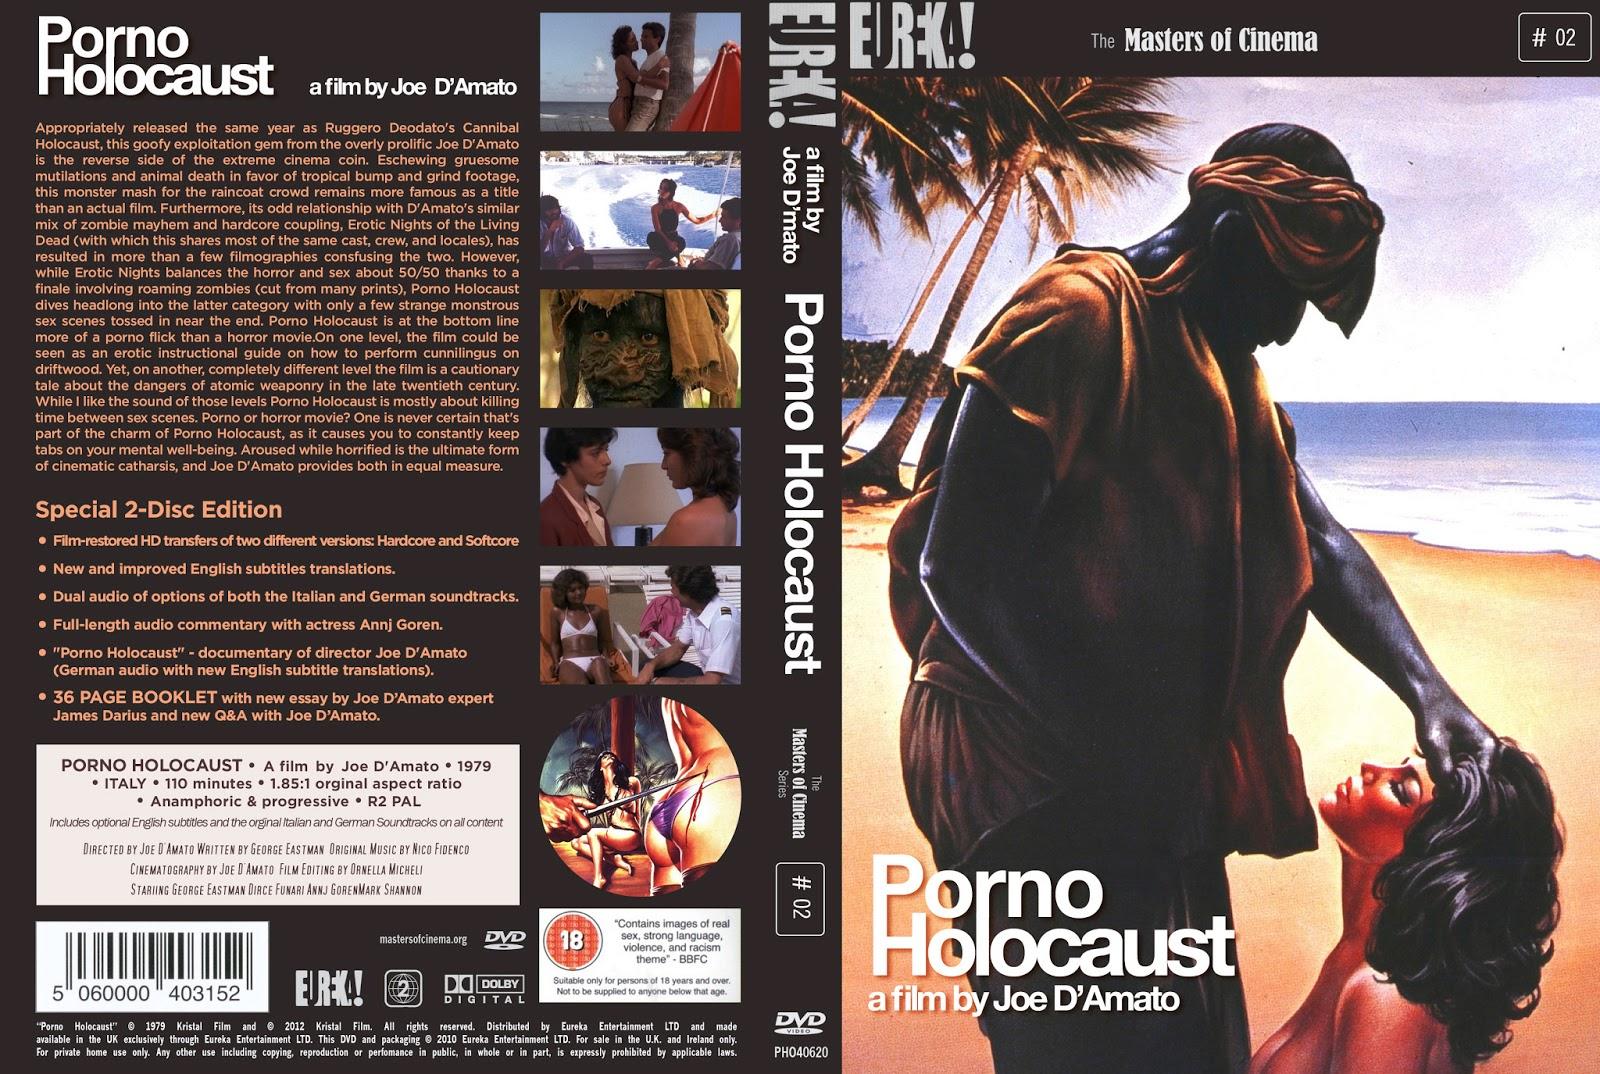 filmi-porno-frg